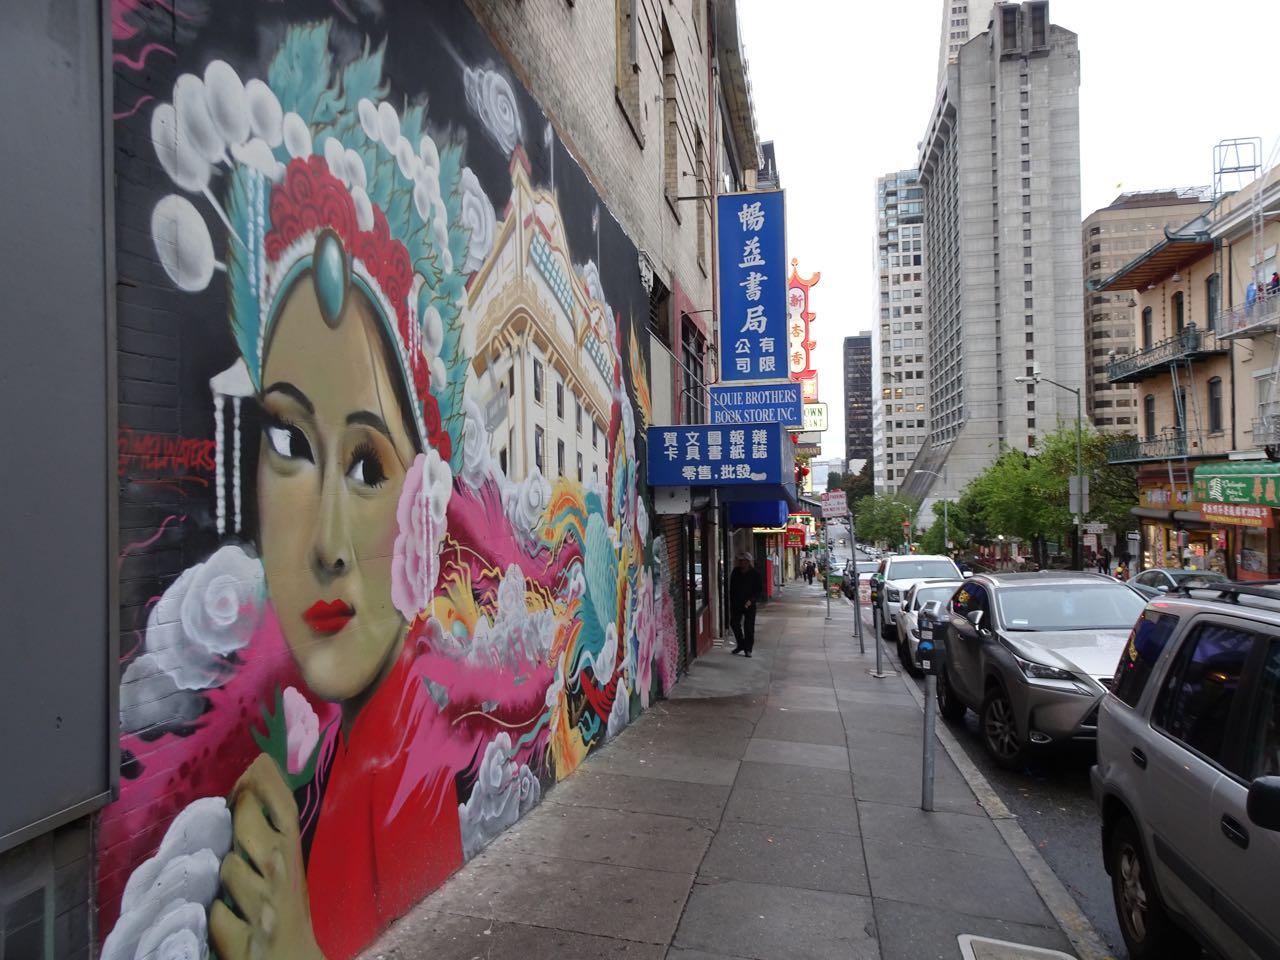 Street Art in Chinatown